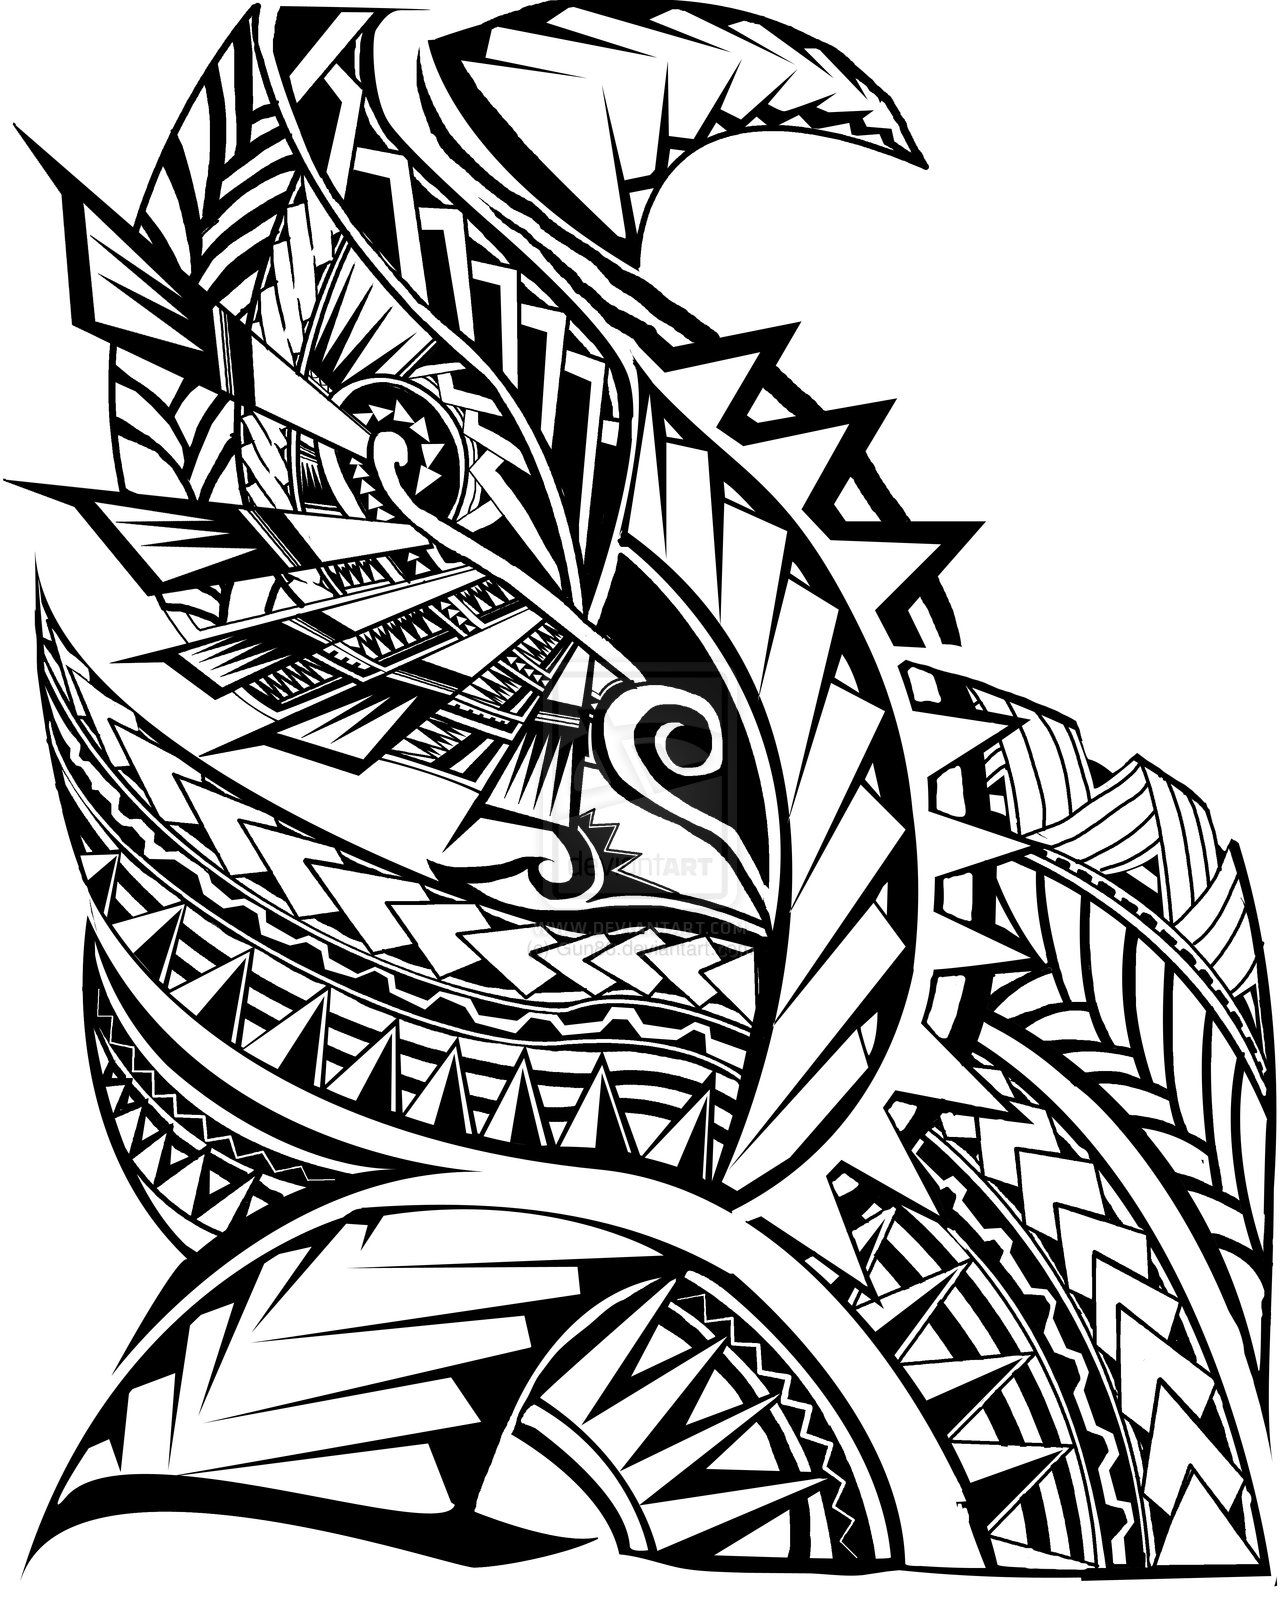 Samoan Tattoo Designs Tribal1 Jpg 1280 1600 Polynesian Tattoo Designs Tribal Tattoos Hawaiian Tattoo